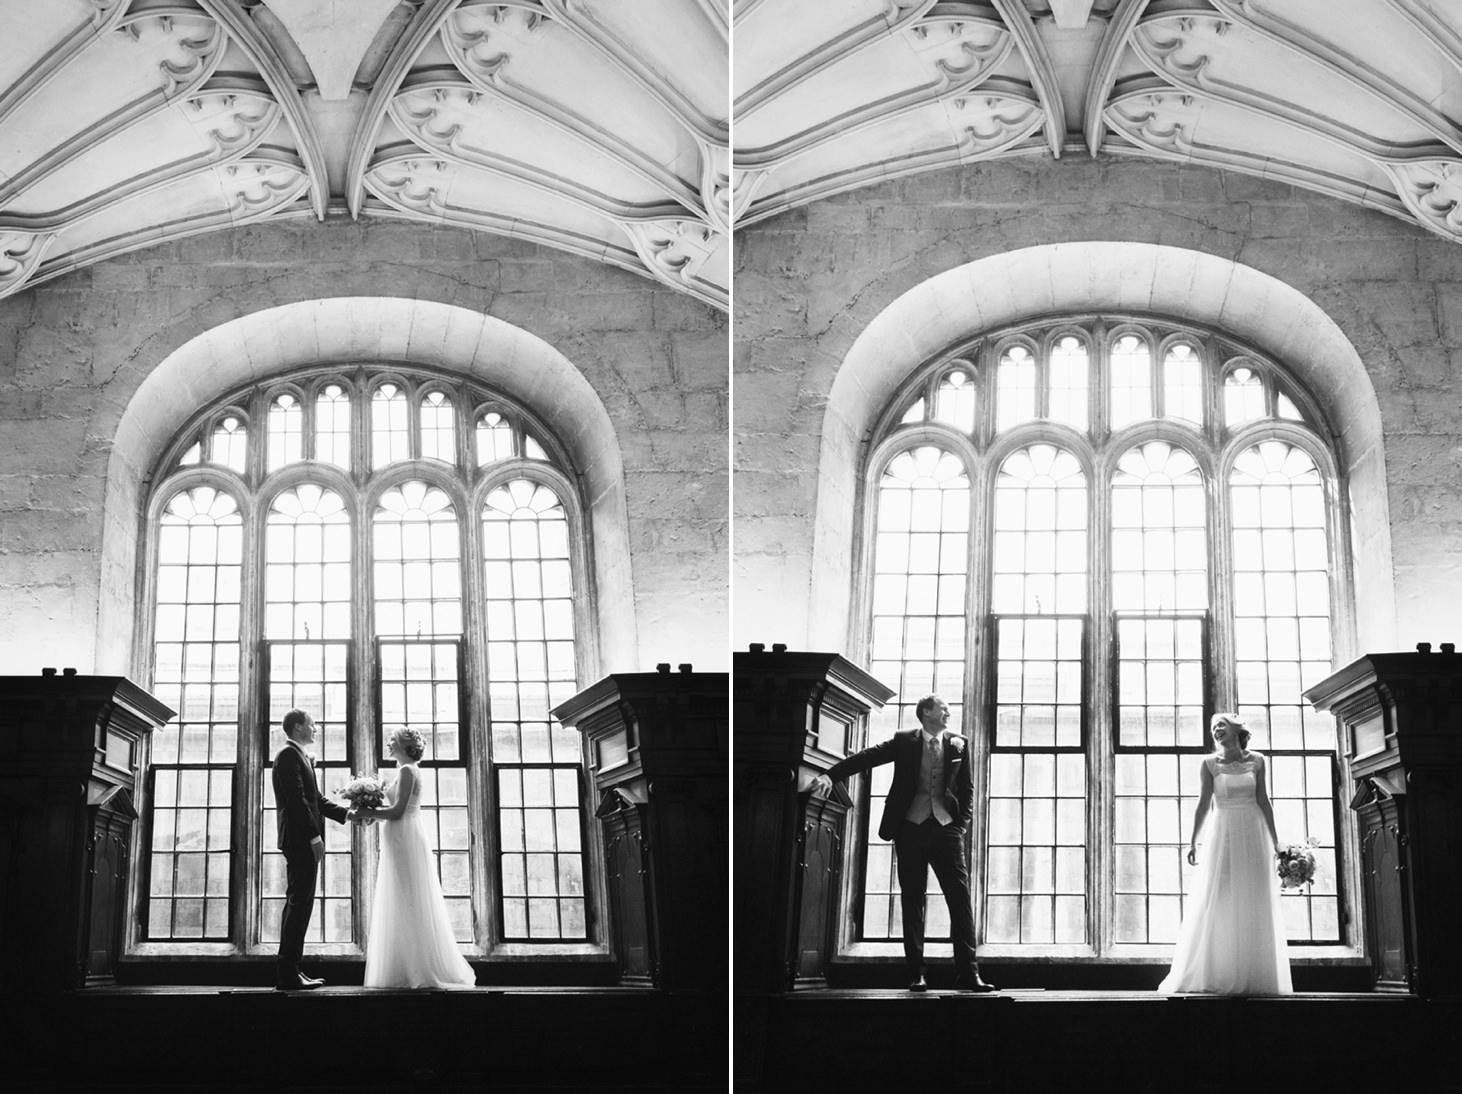 Bodleian library wedding window portrait